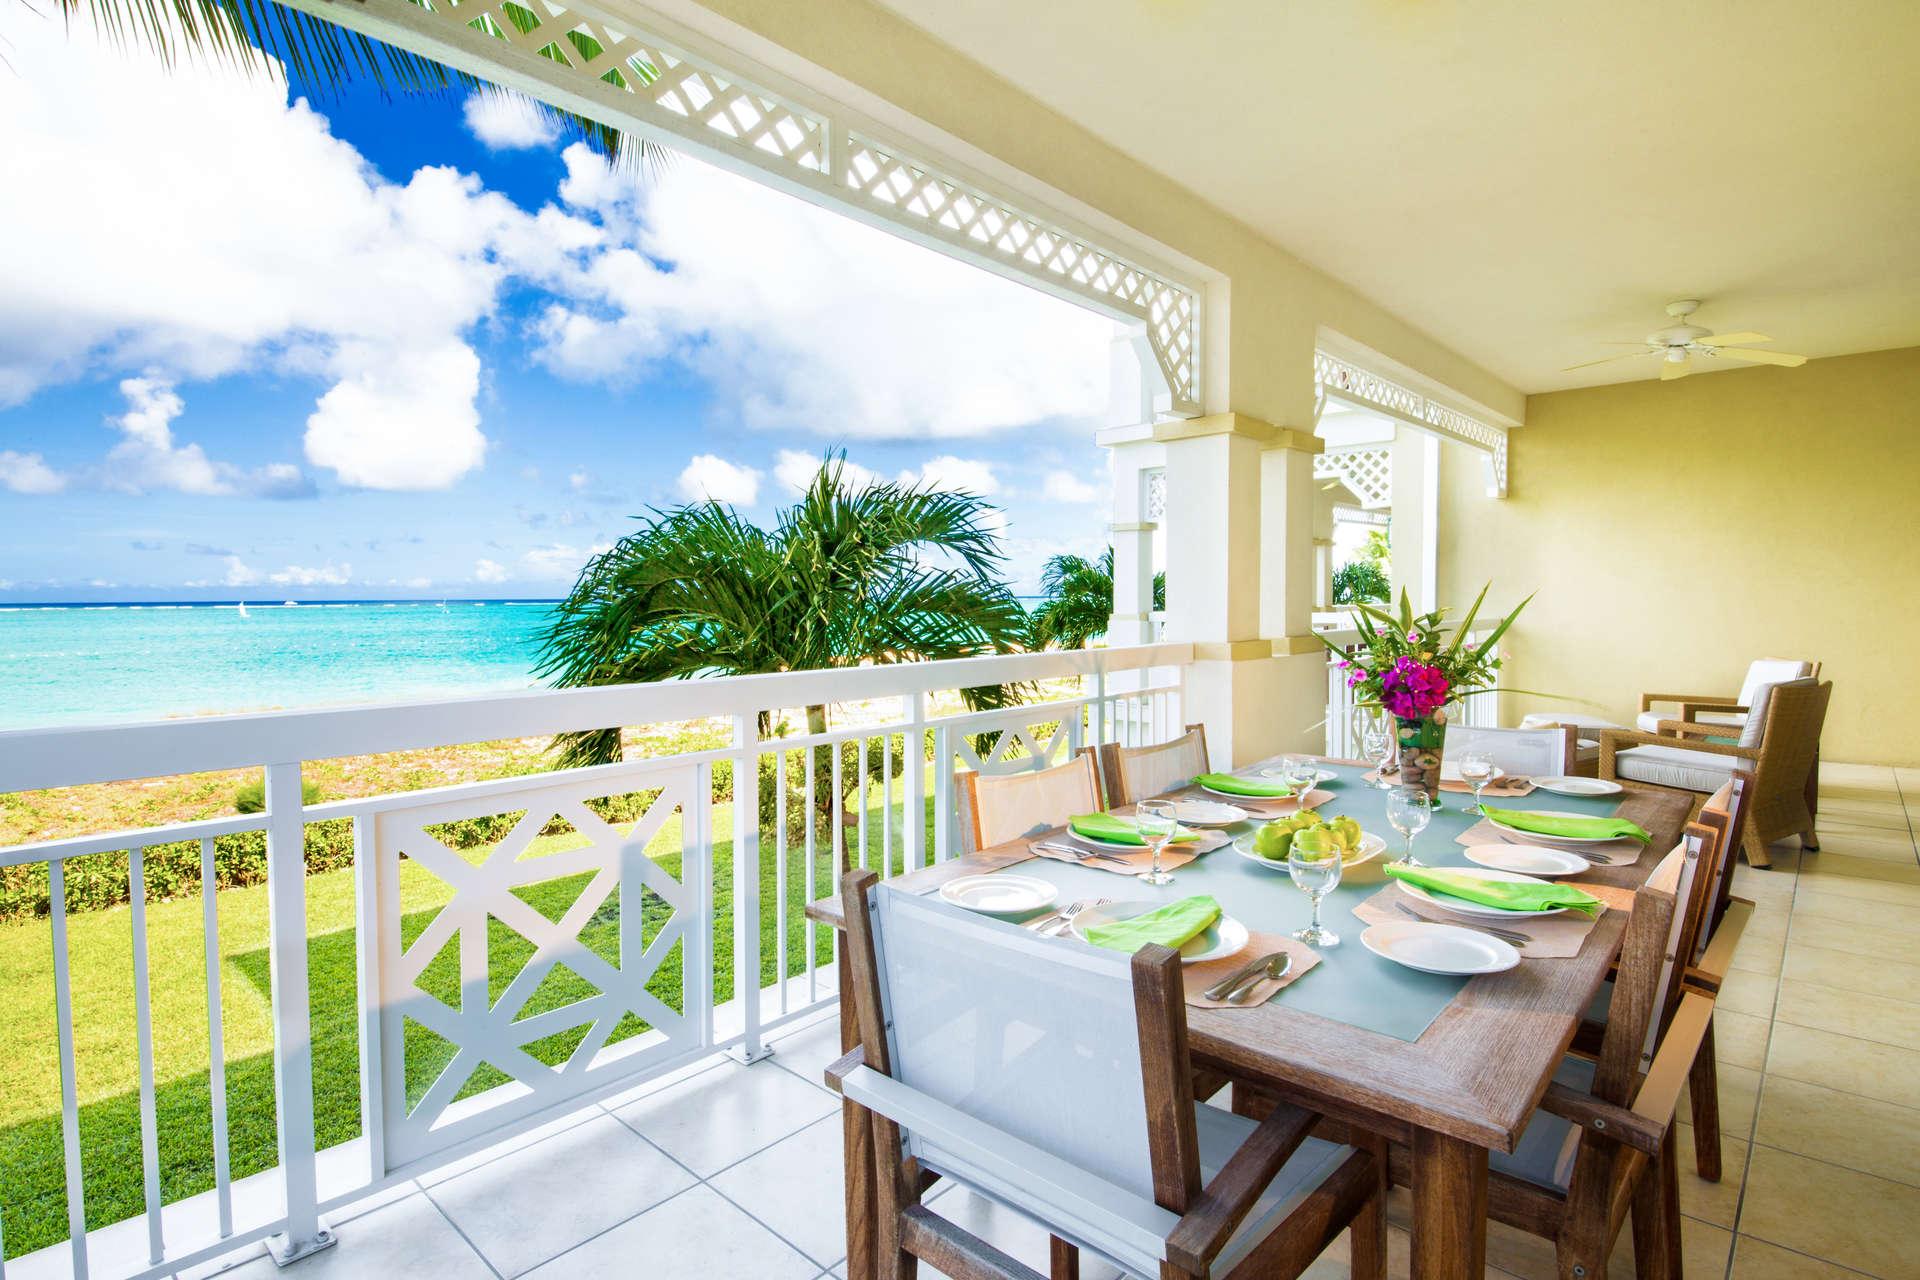 Luxury villa rentals caribbean - Turks and caicos - Providenciales - Alexandra resort - Deluxe Ocean Front Suite | 2 Bedroom - Image 1/12